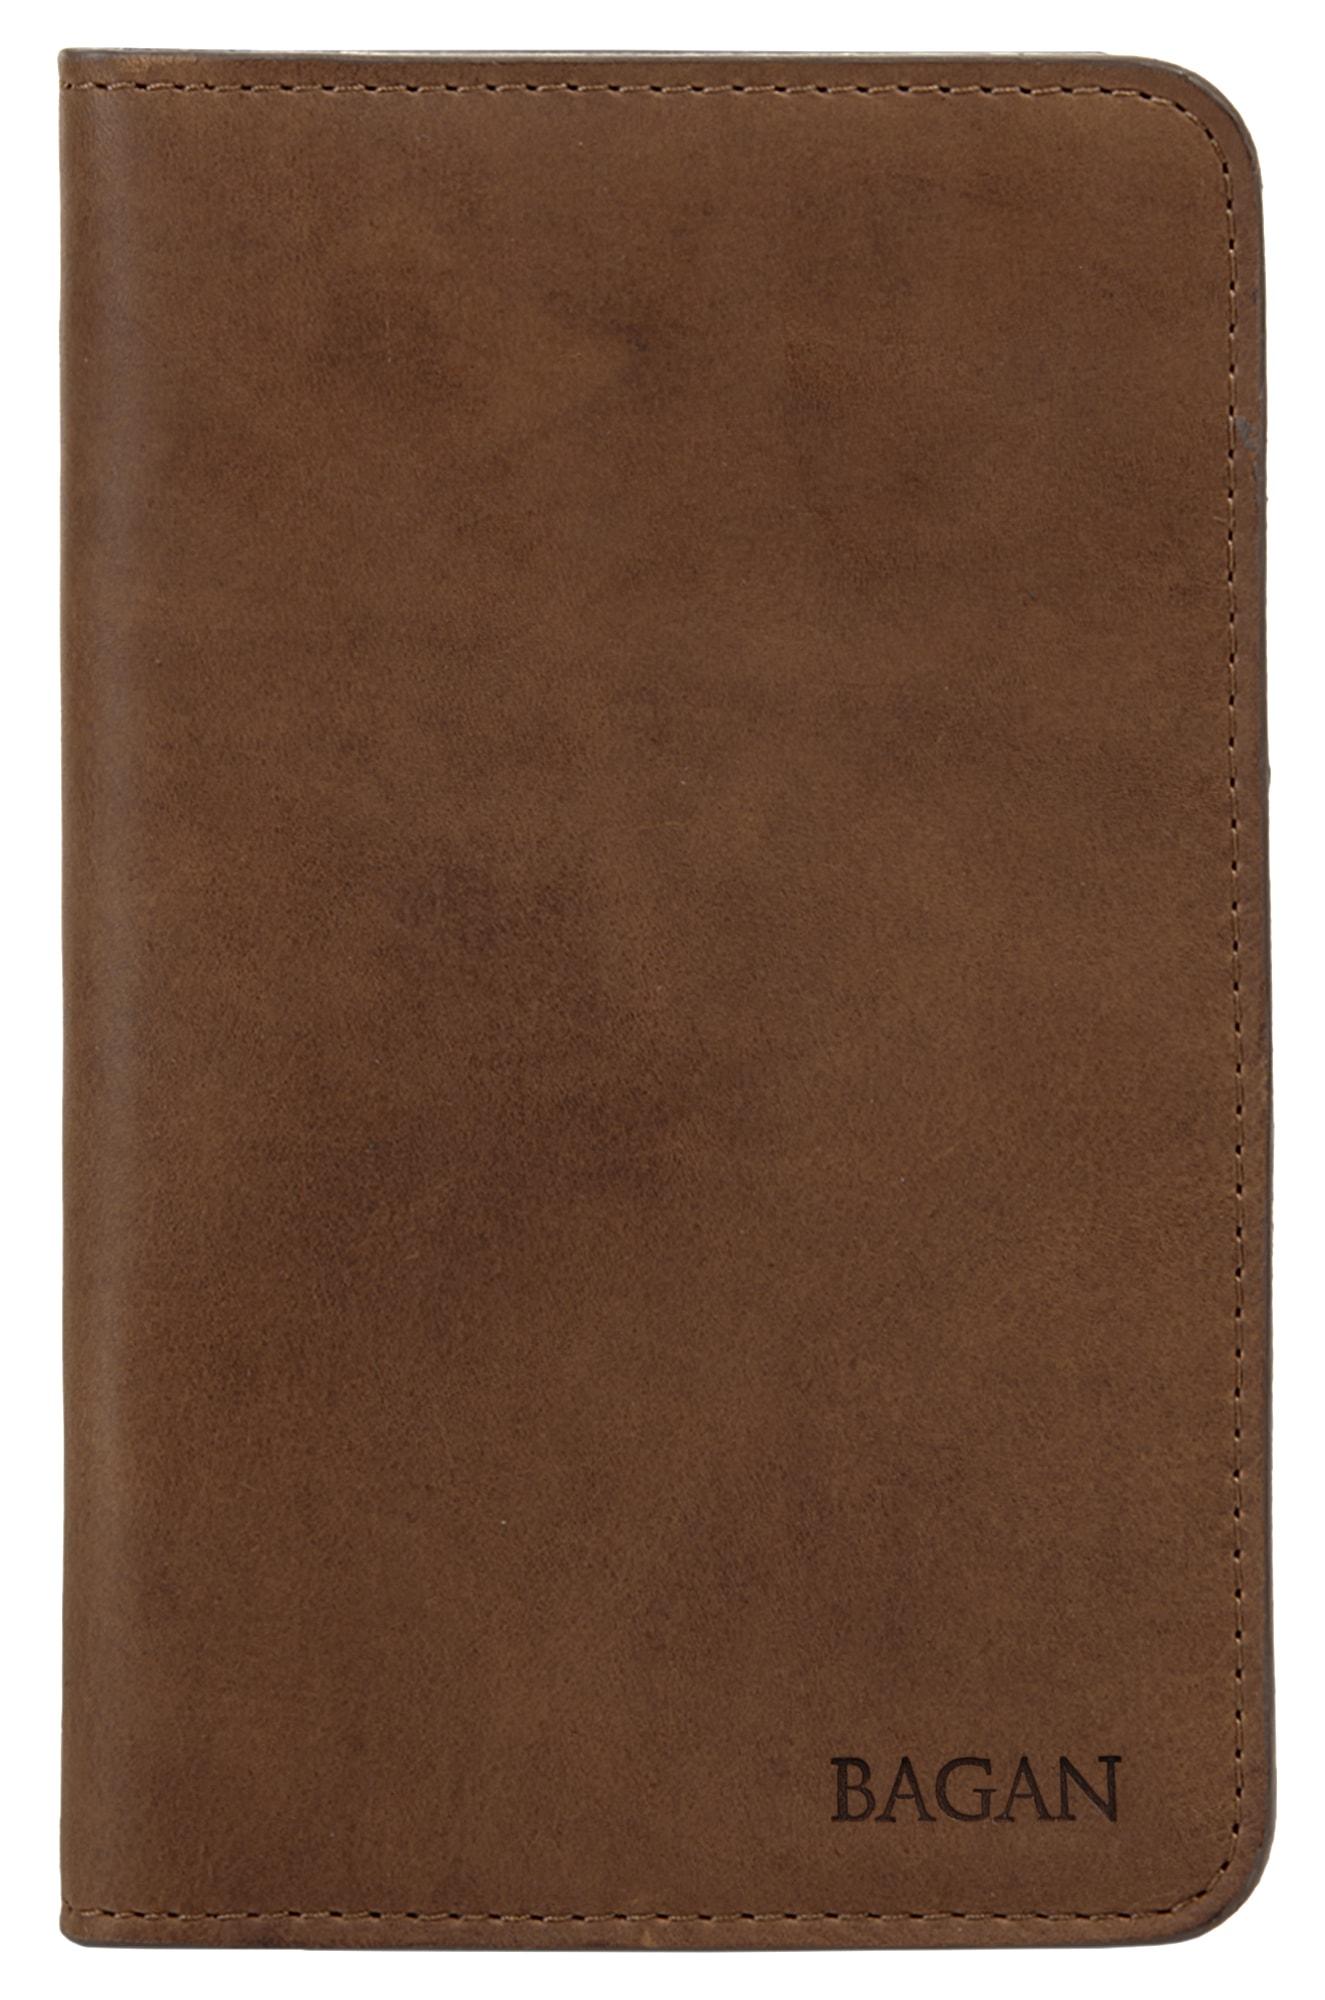 Image of Bagan Brieftasche